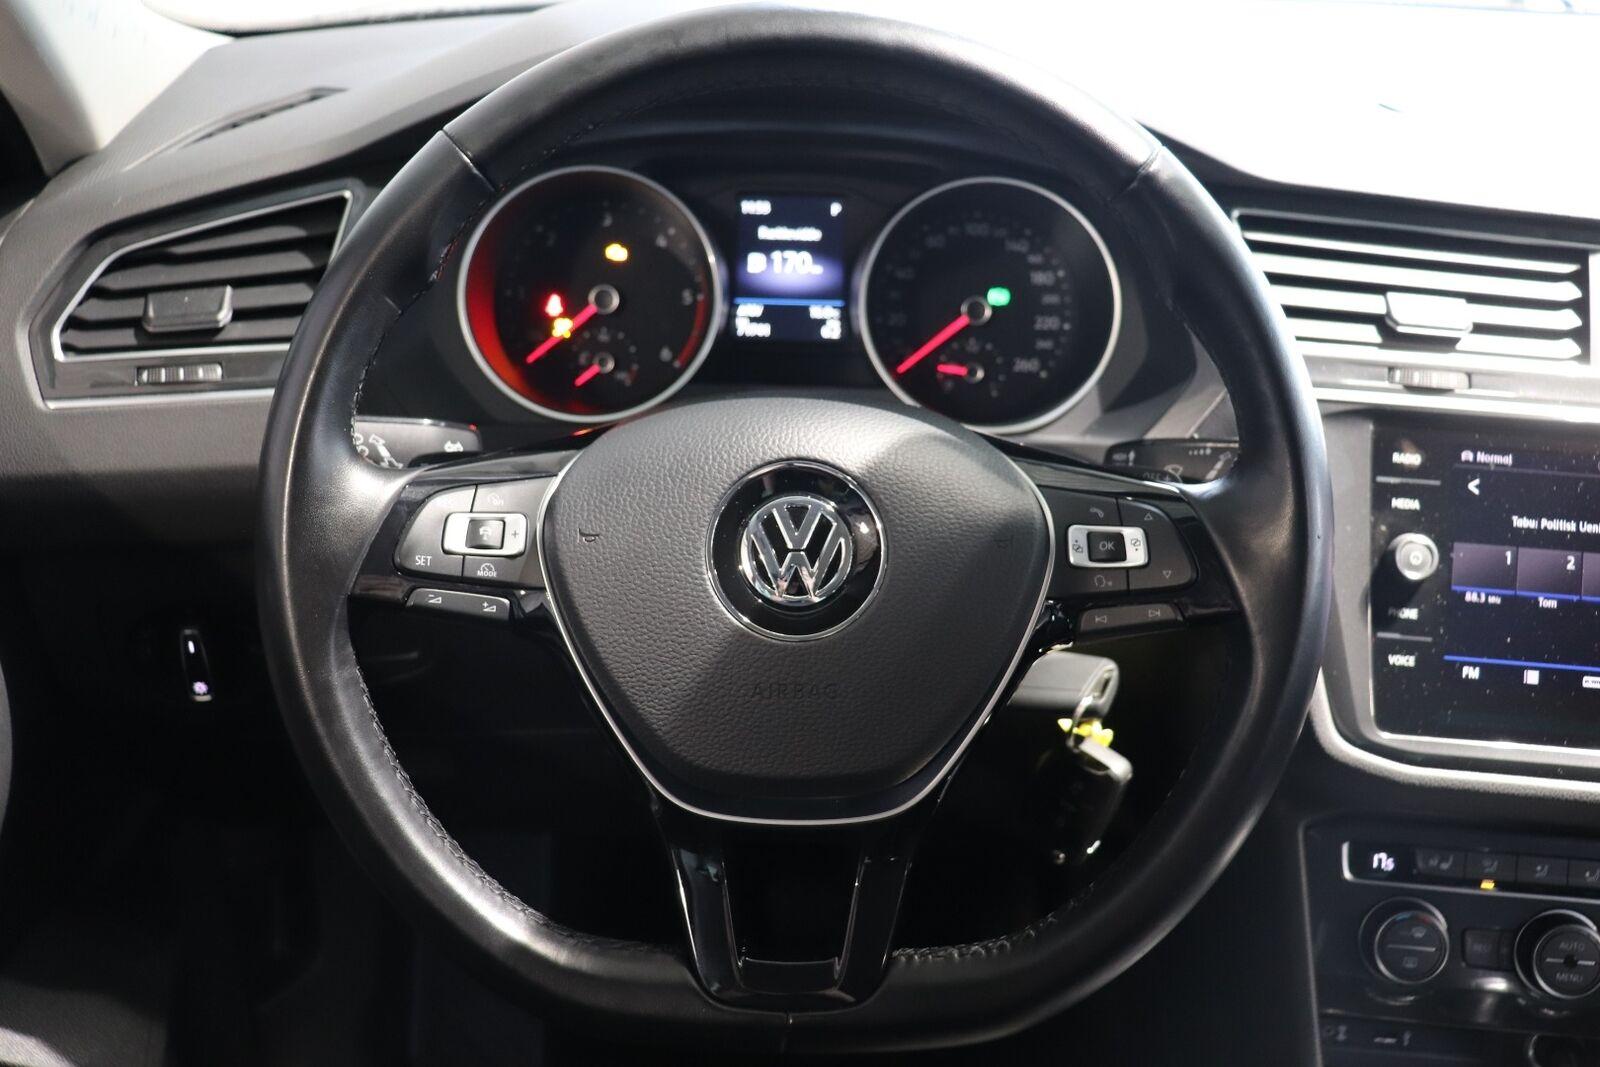 VW Tiguan TDi 150 Comfortline DSG 4M